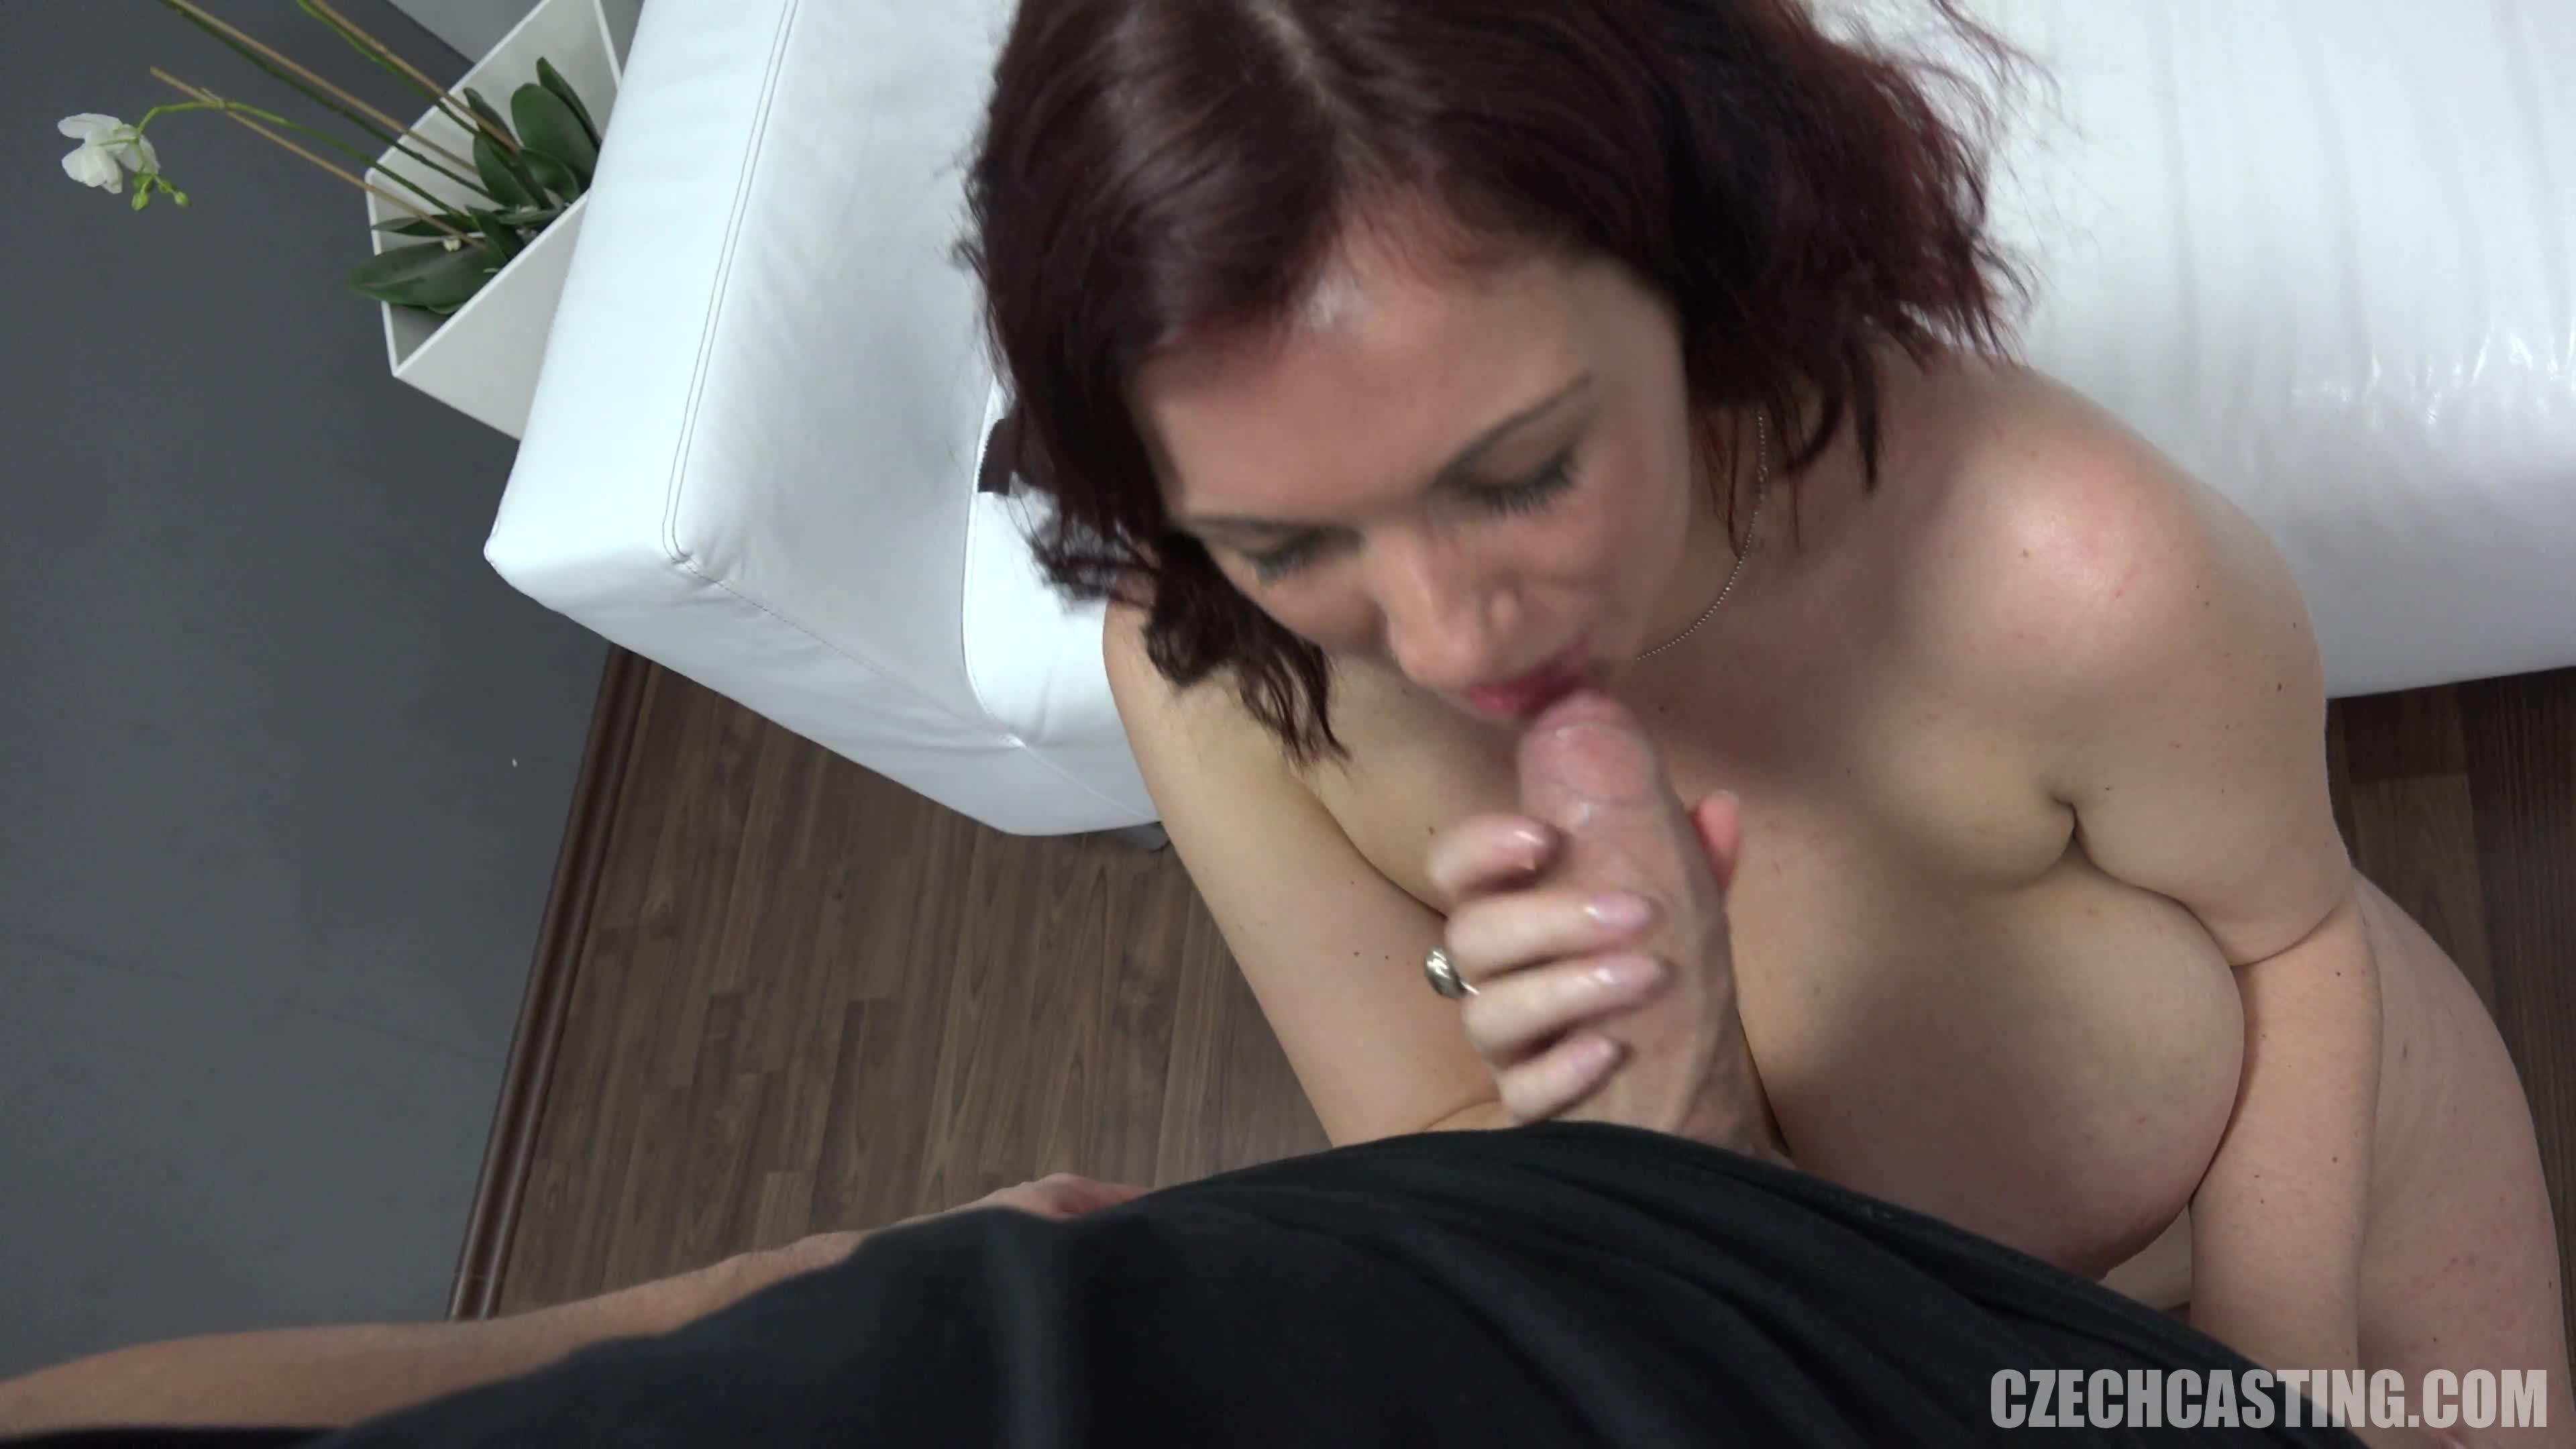 Big tits casting czech Big boobs